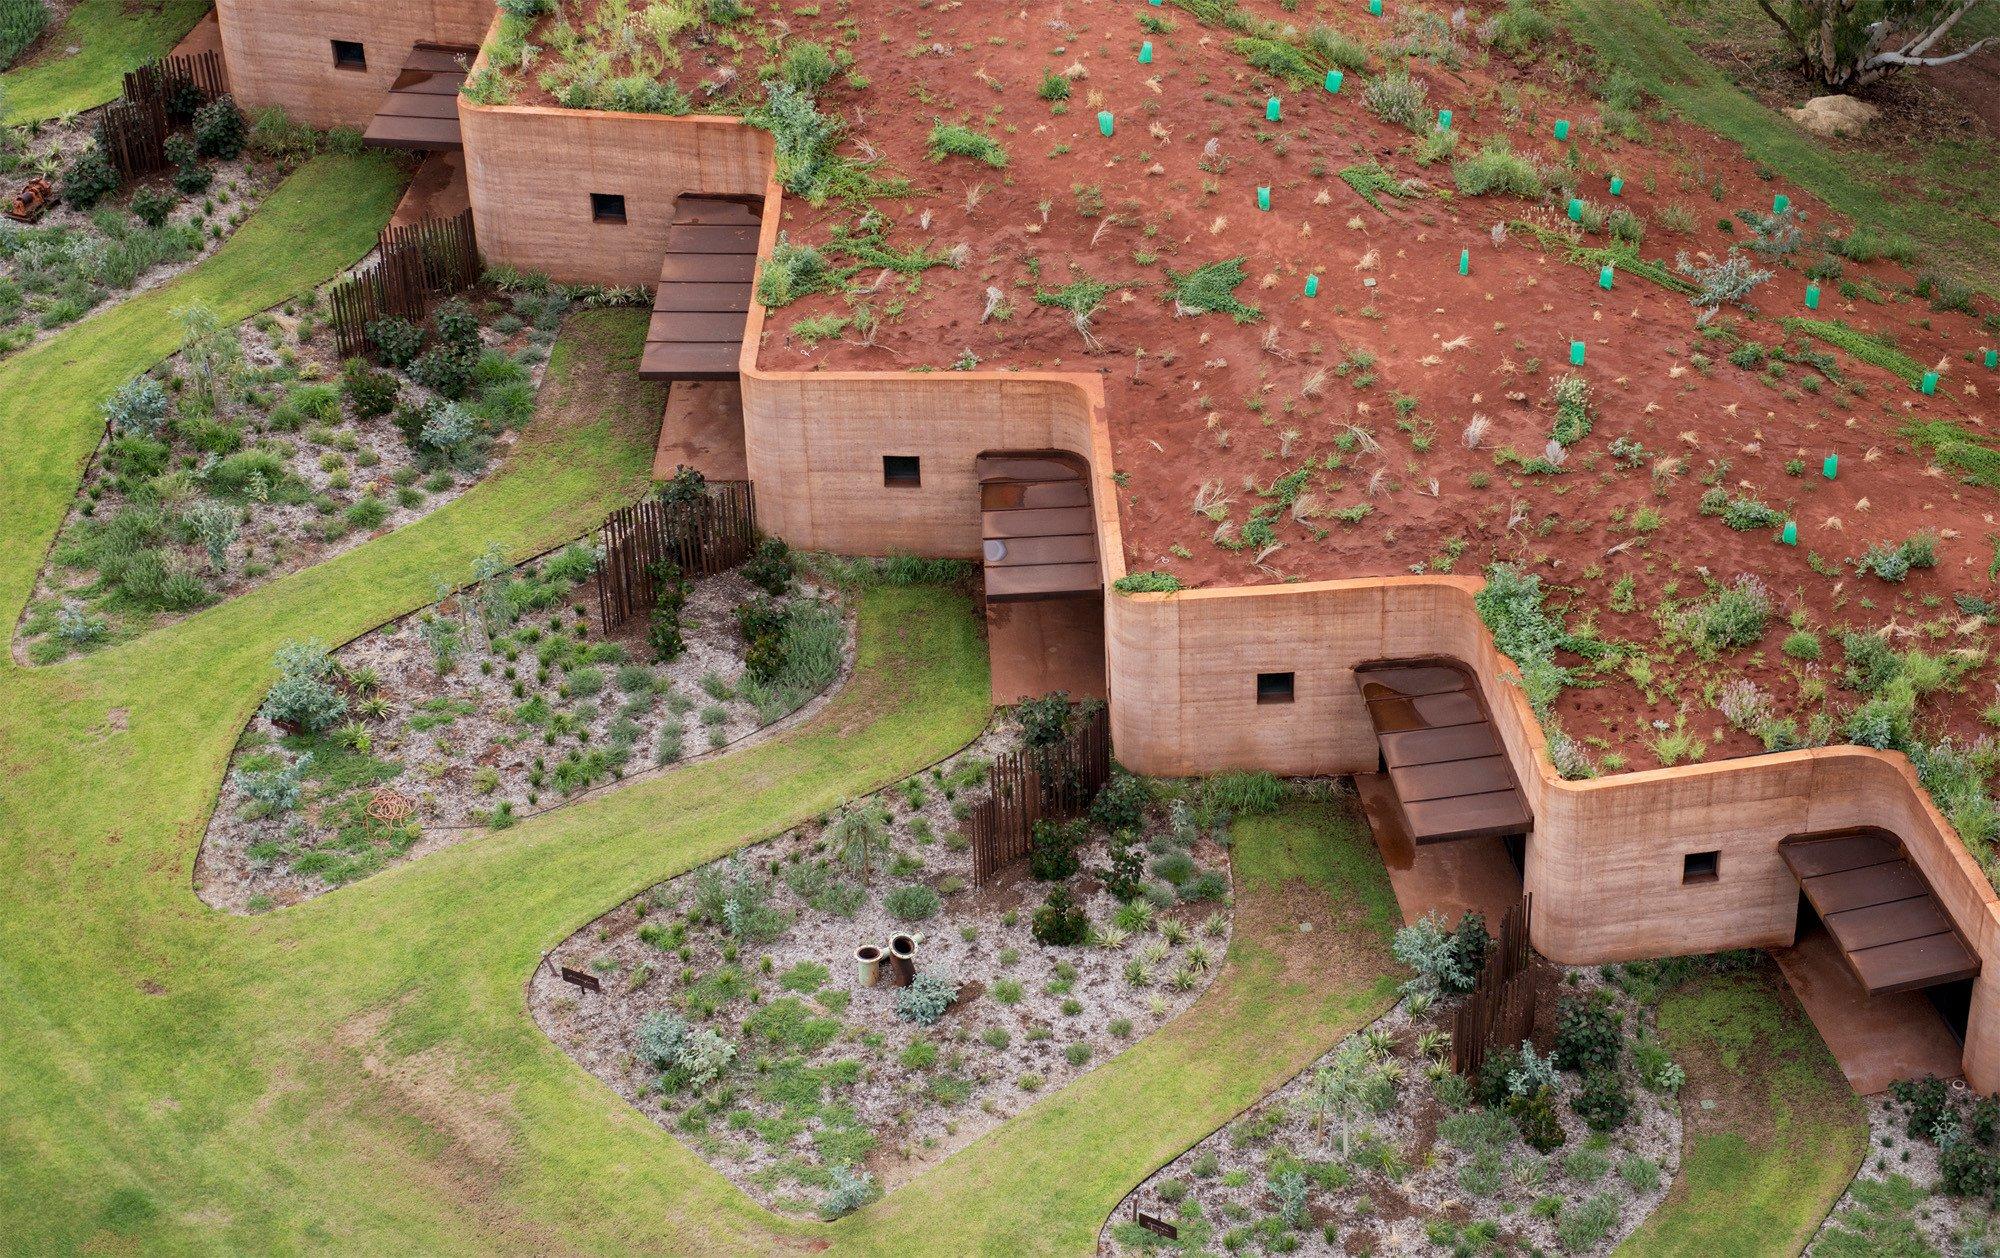 Apartments The Great Wall in Western Australia | Flachdach | Wohnen ...